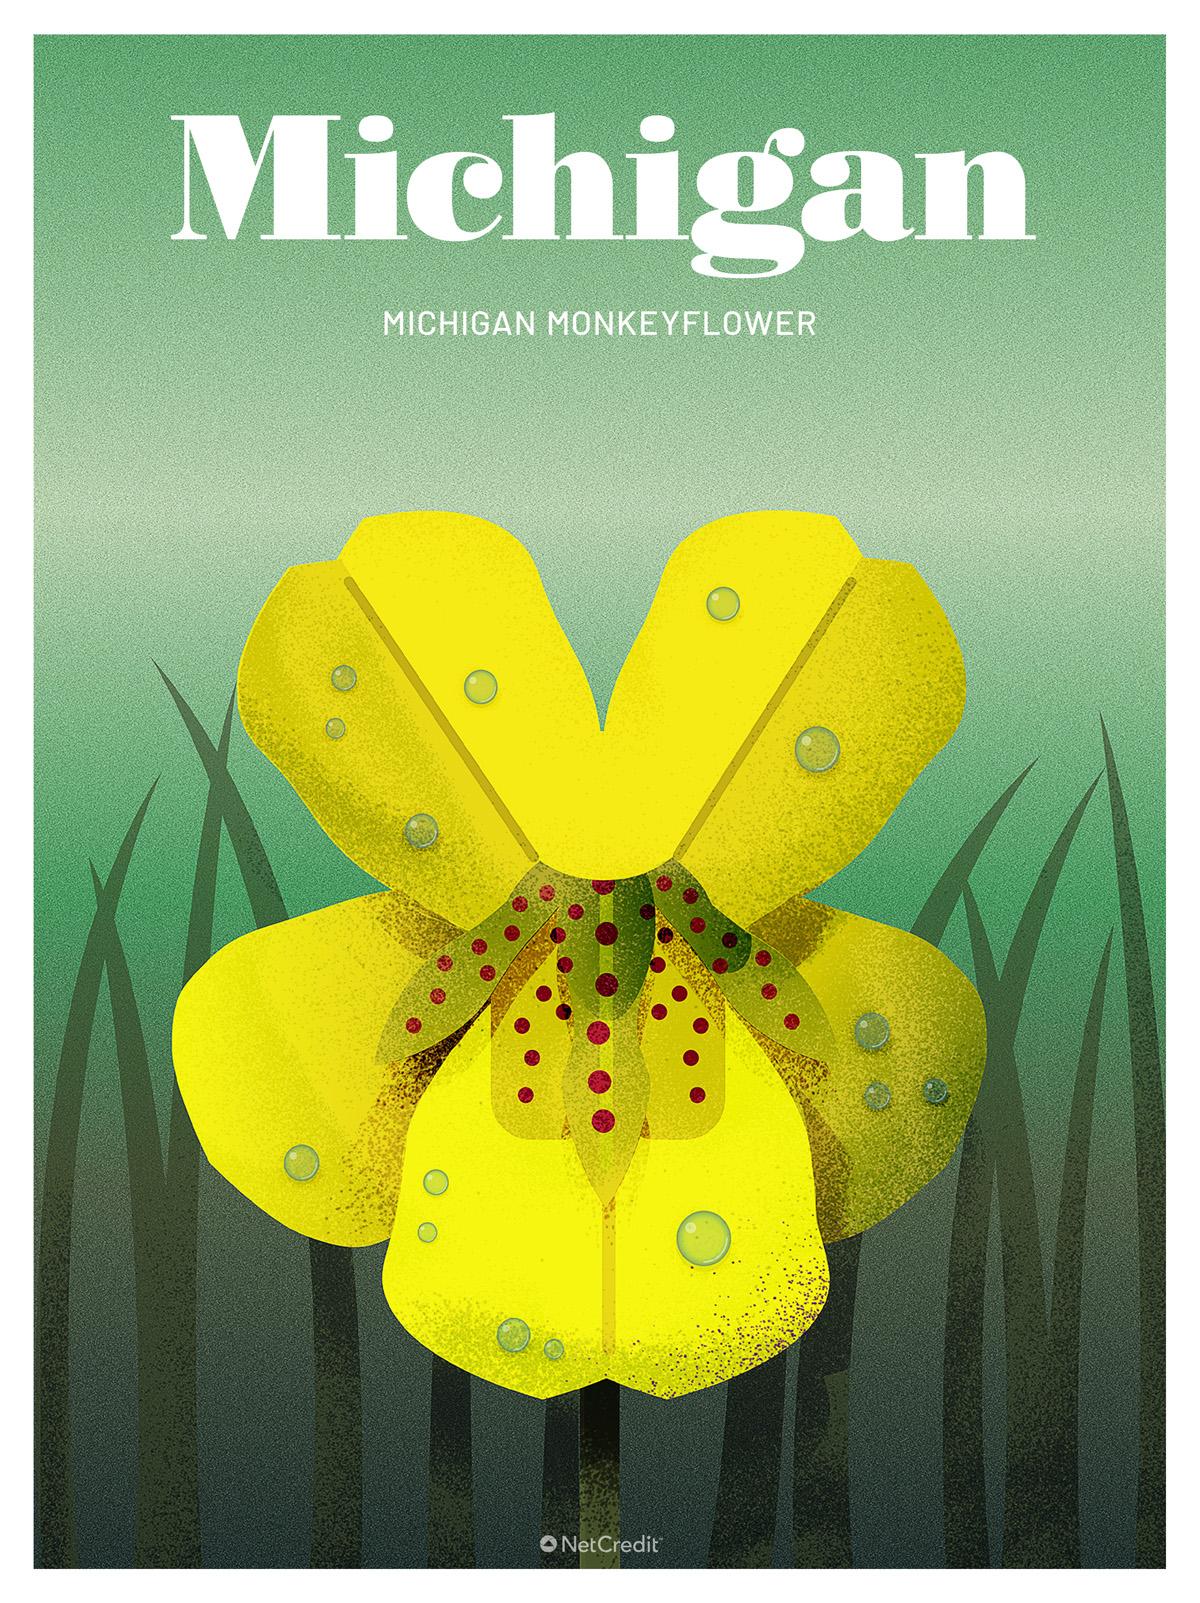 Endangered Plant in Michigan: Monkeyflower